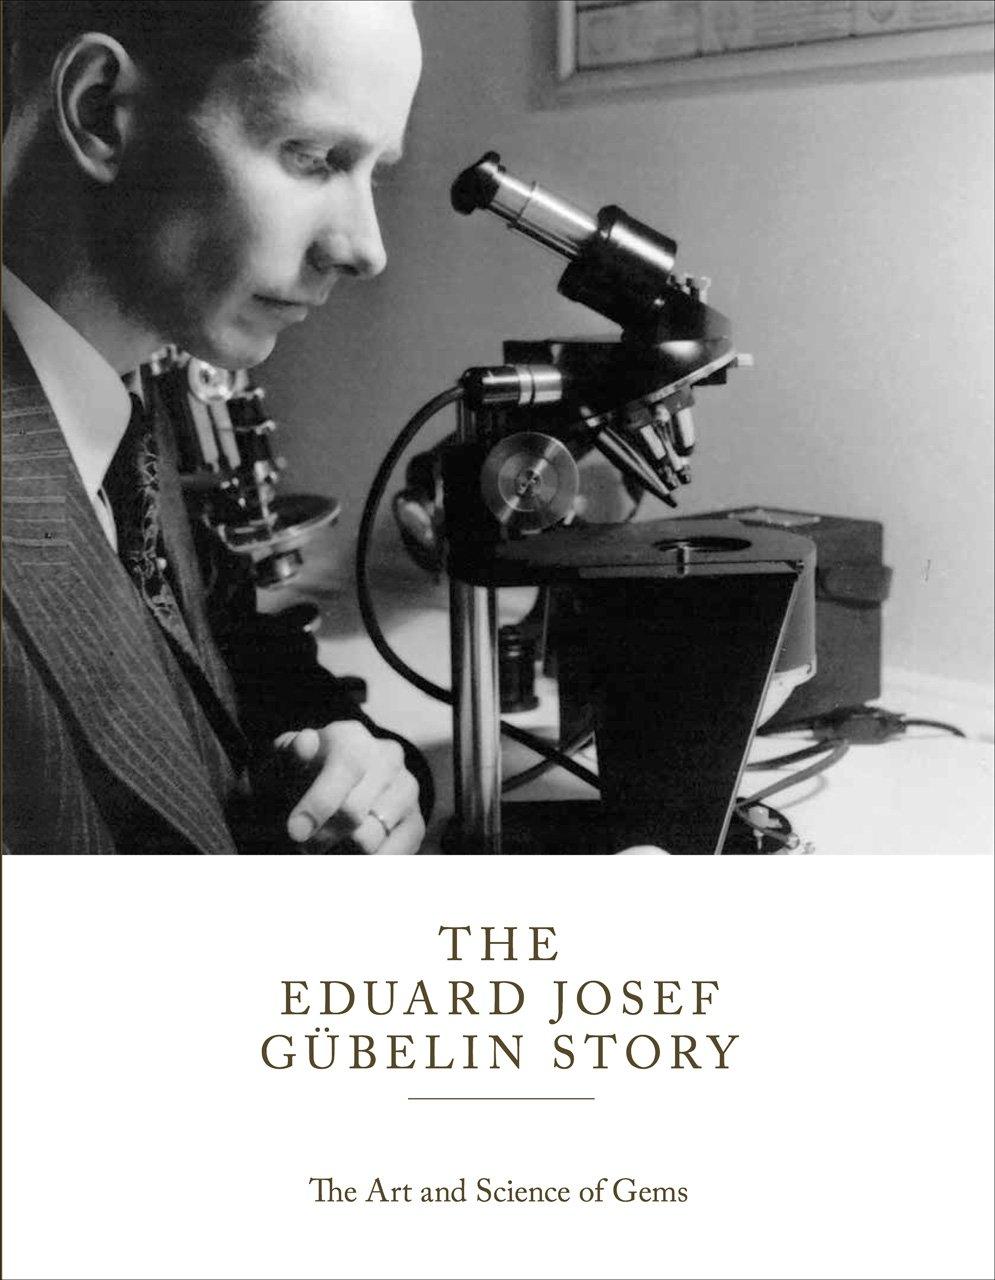 The Eduard Josef Gübelin Story: The Art and Science of Gems PDF